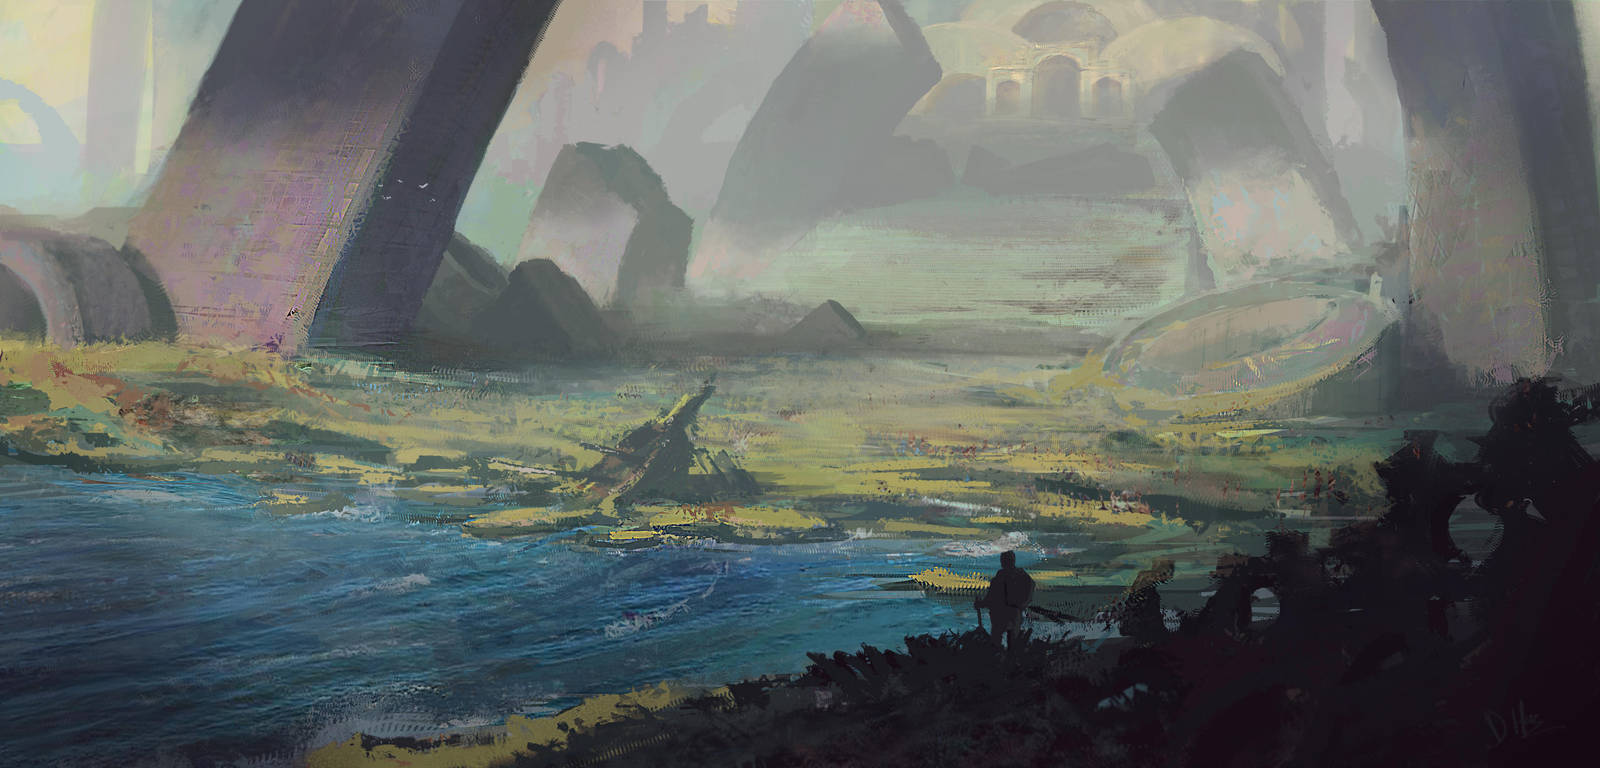 Lost city of Arah by XGhastX